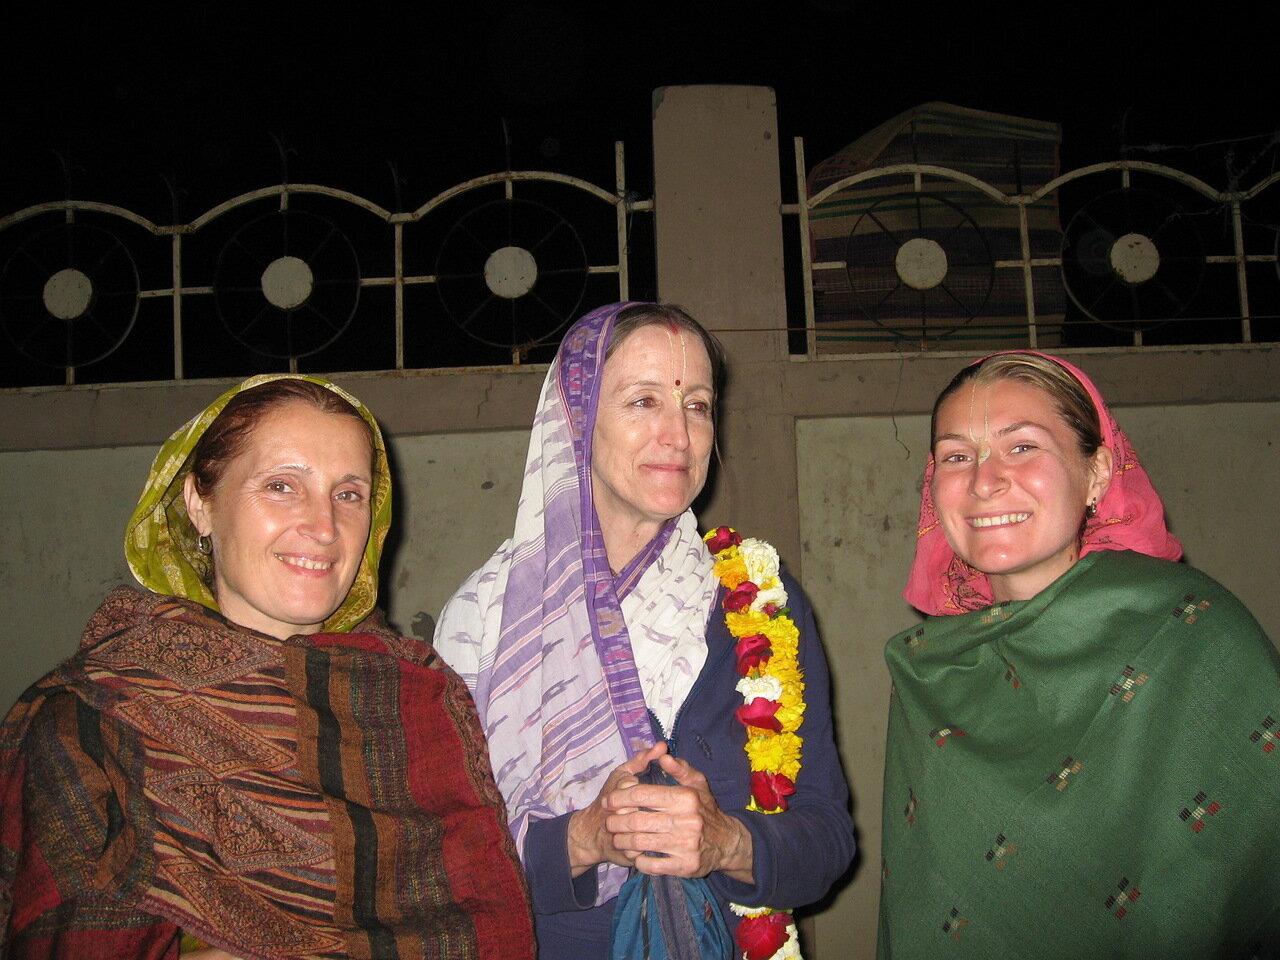 Нанди Мукхи деви даси и ученица Шрилы Прабхупады возле лазарета во Вриндаване